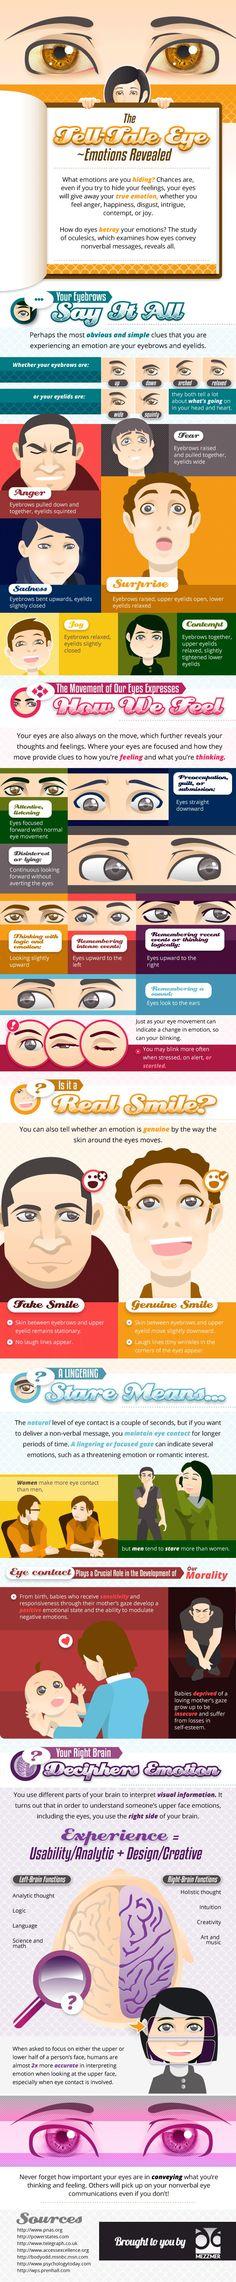 emotional intelligence infographic   EQ infographic